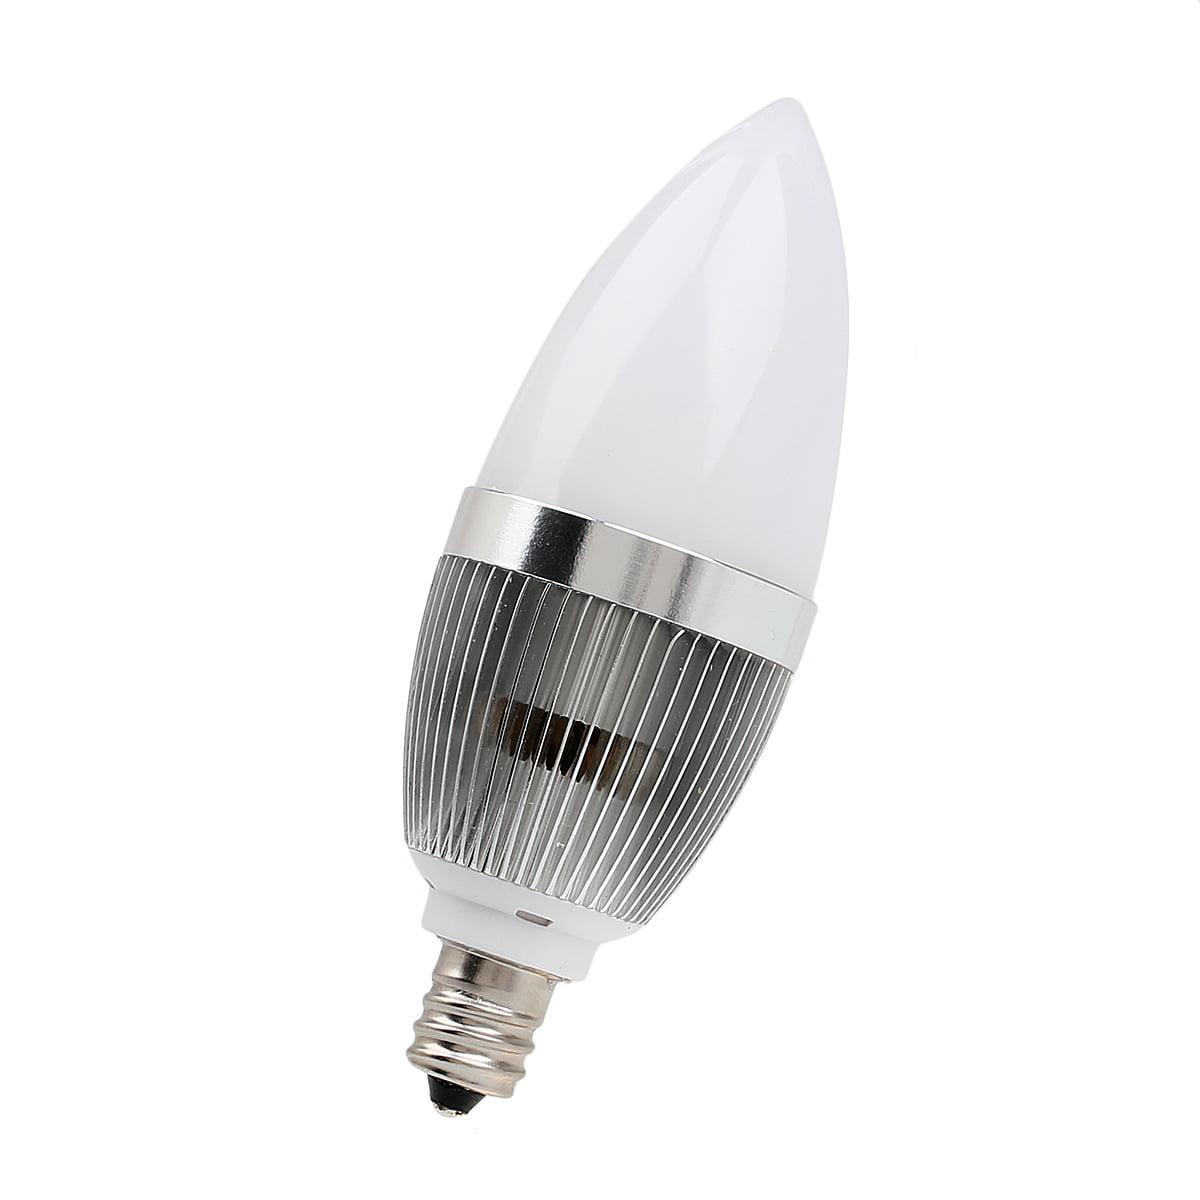 Sunco Lighting 24 PK A15 Dimmable LED Bulb 2700K Soft White 800 Lumens 8W=60W